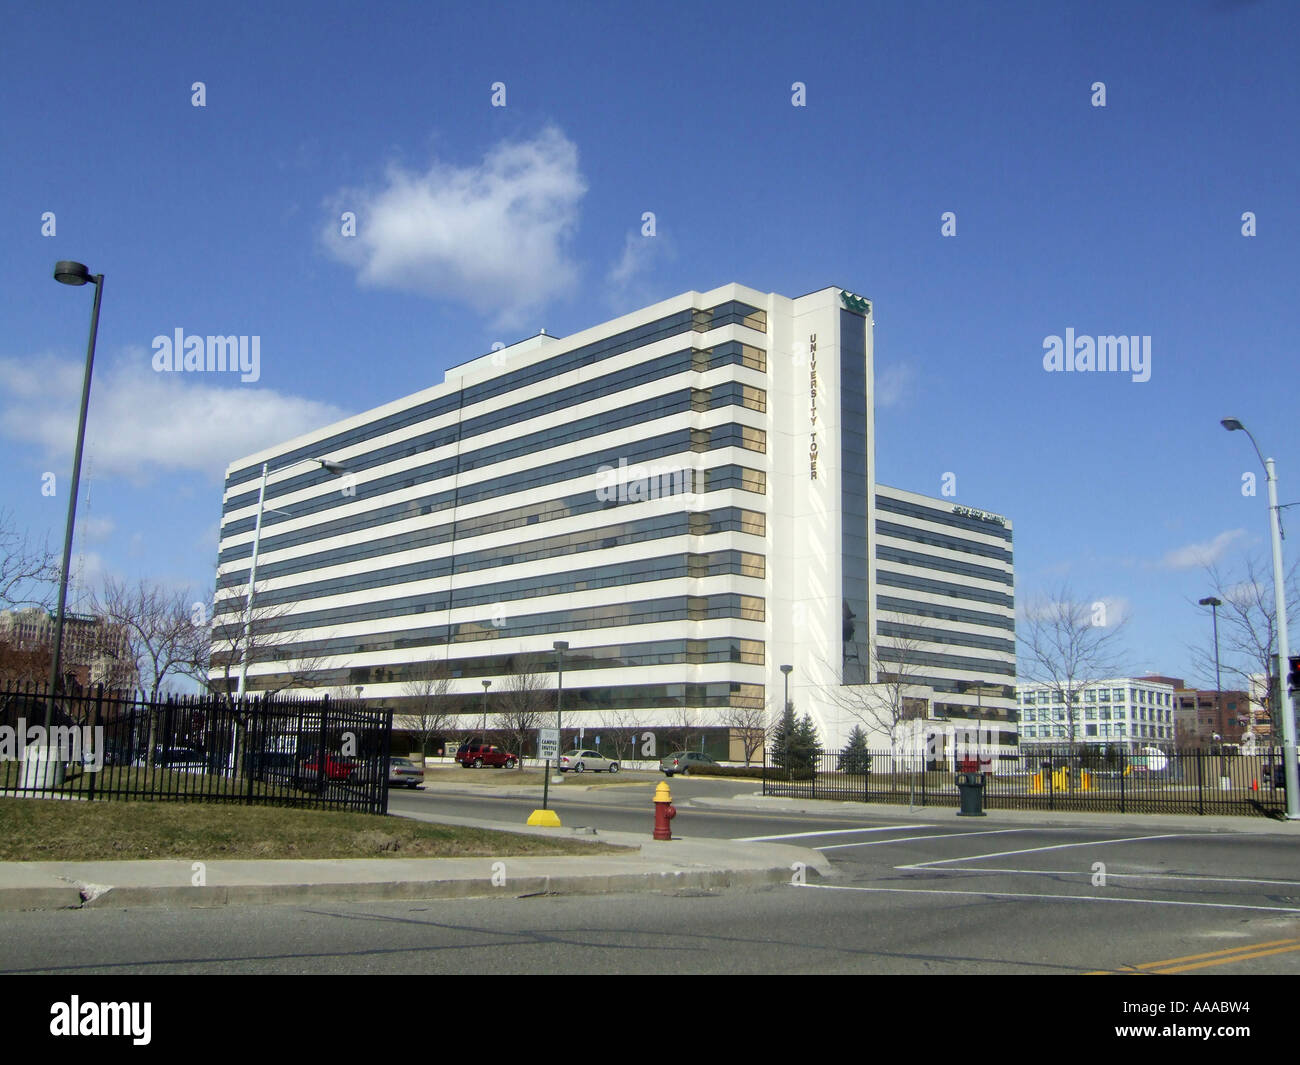 University Towers condominium development in downtown Detroit Michigan MI - Stock Image